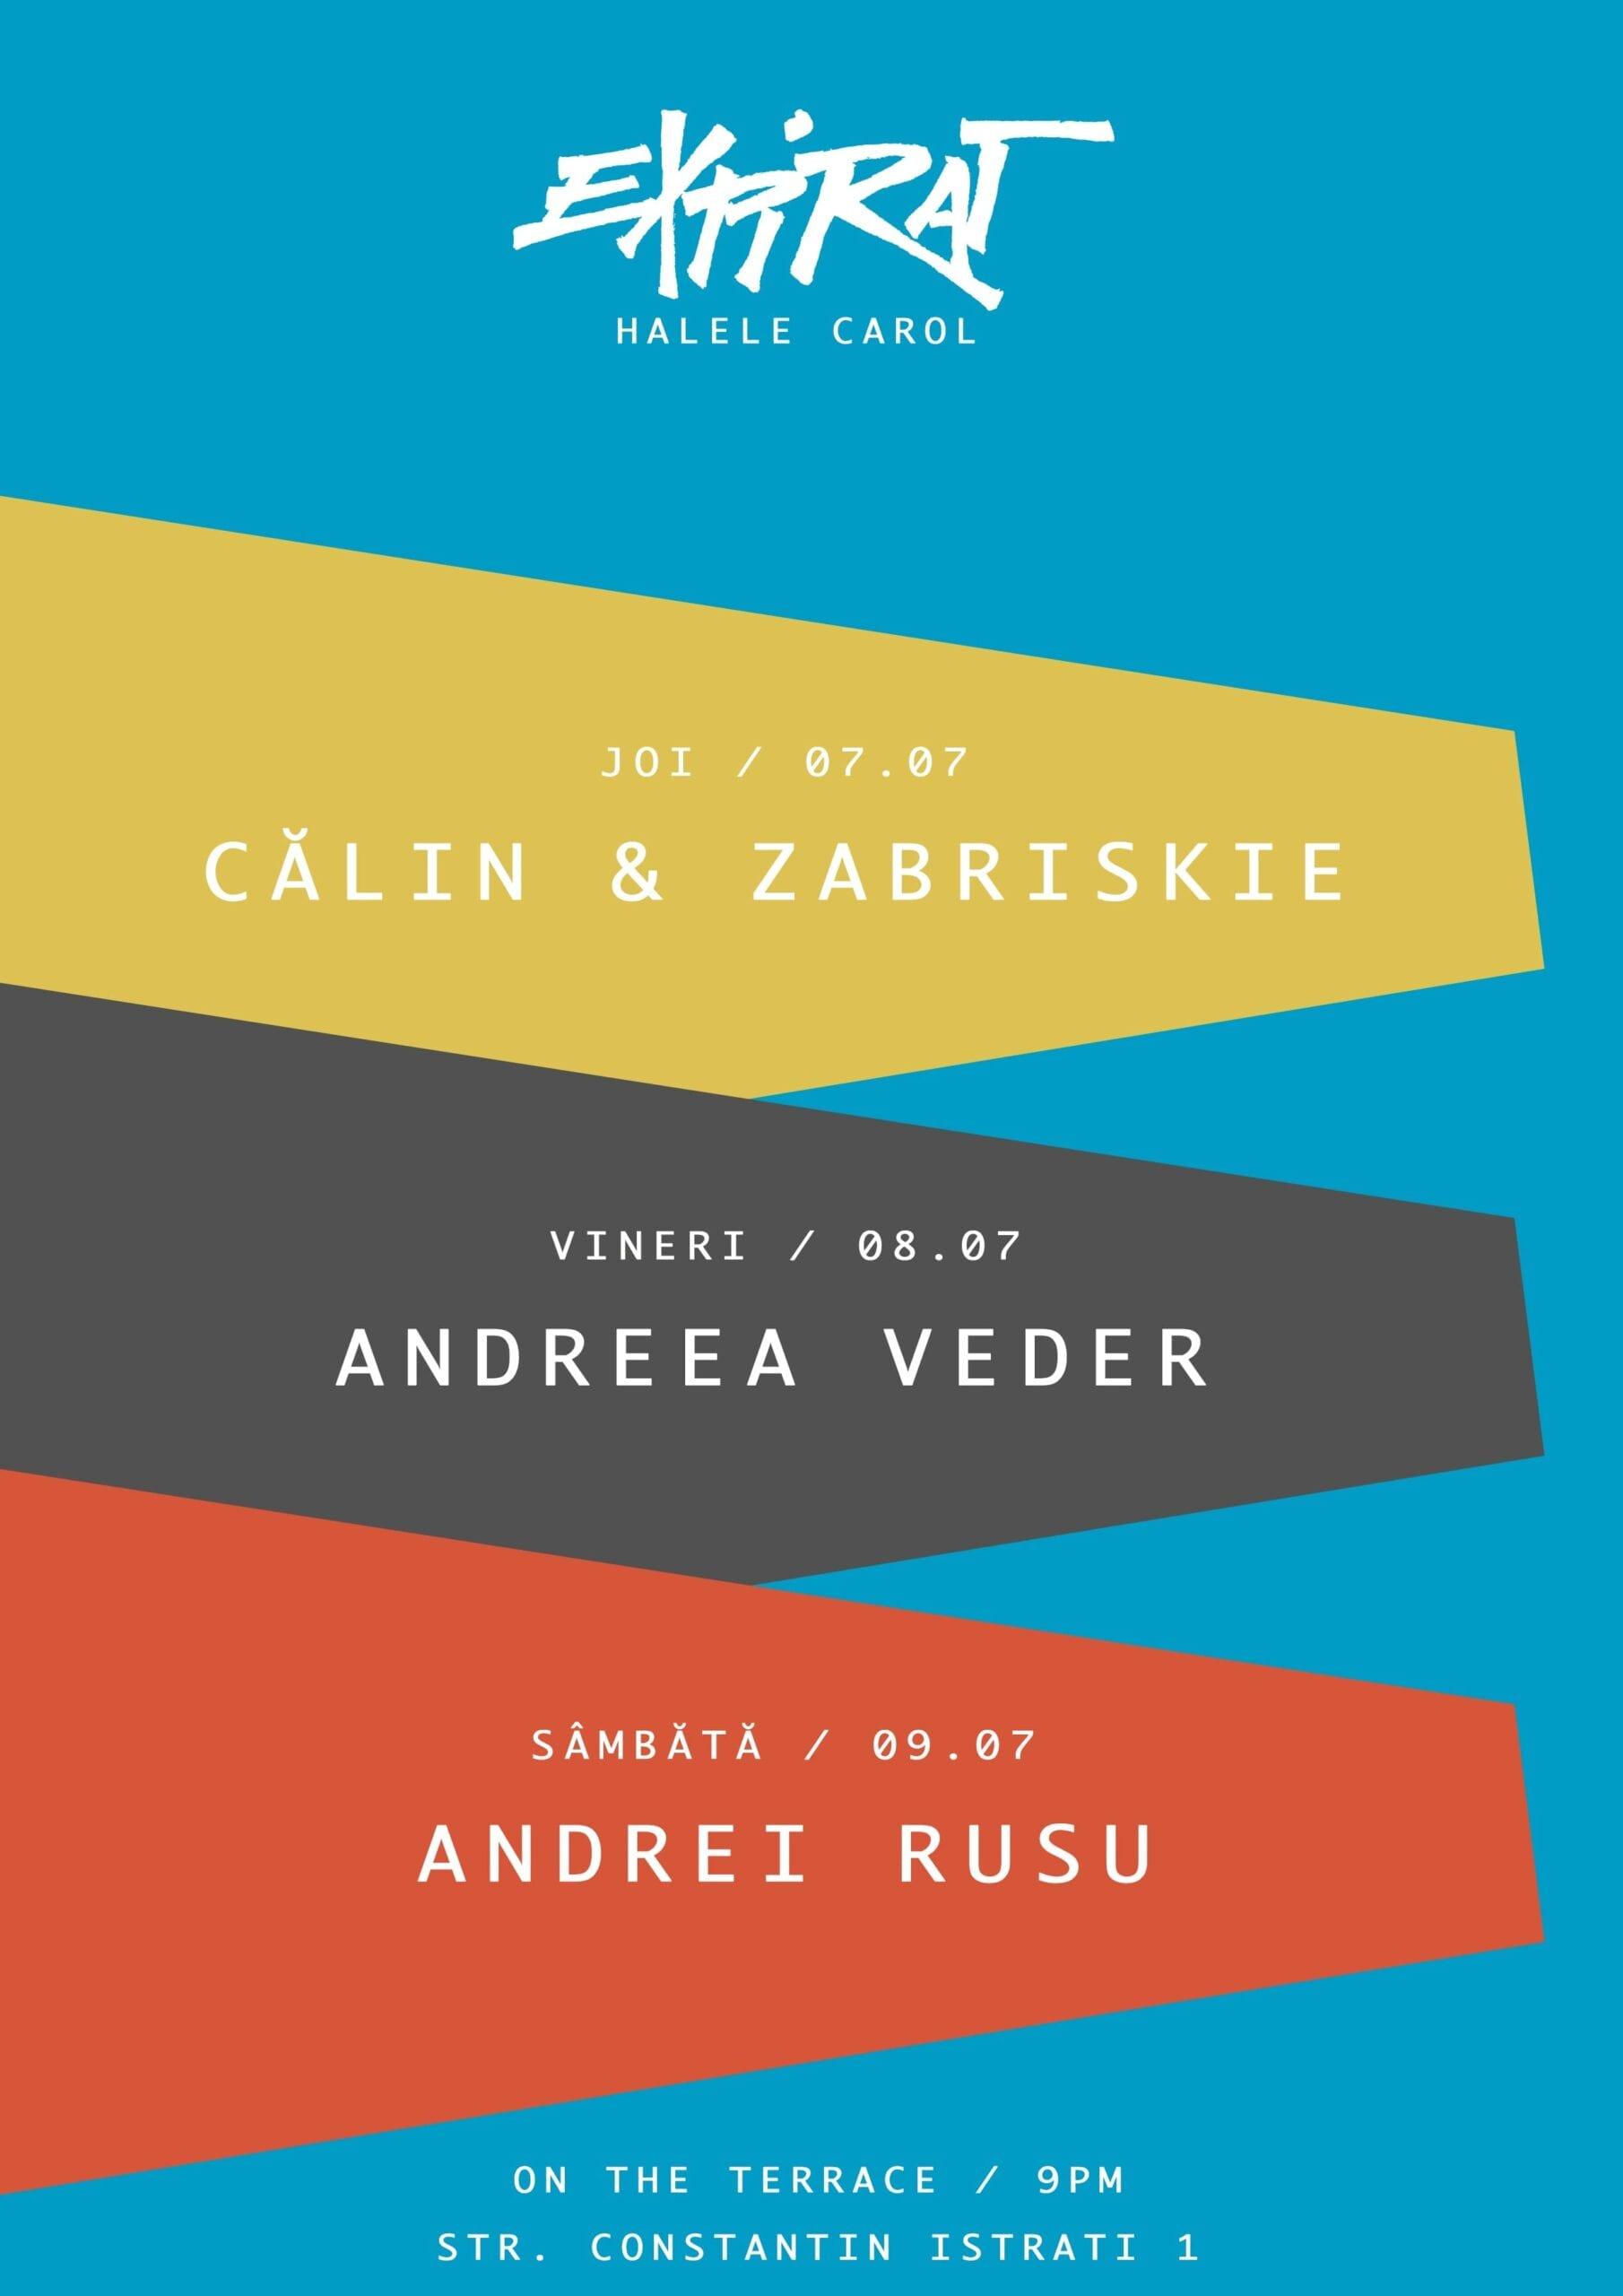 Călin & Zabriskie / Andreea Veder / Andrei Rusu / Expirat Halele Carol / 07-08-09.07